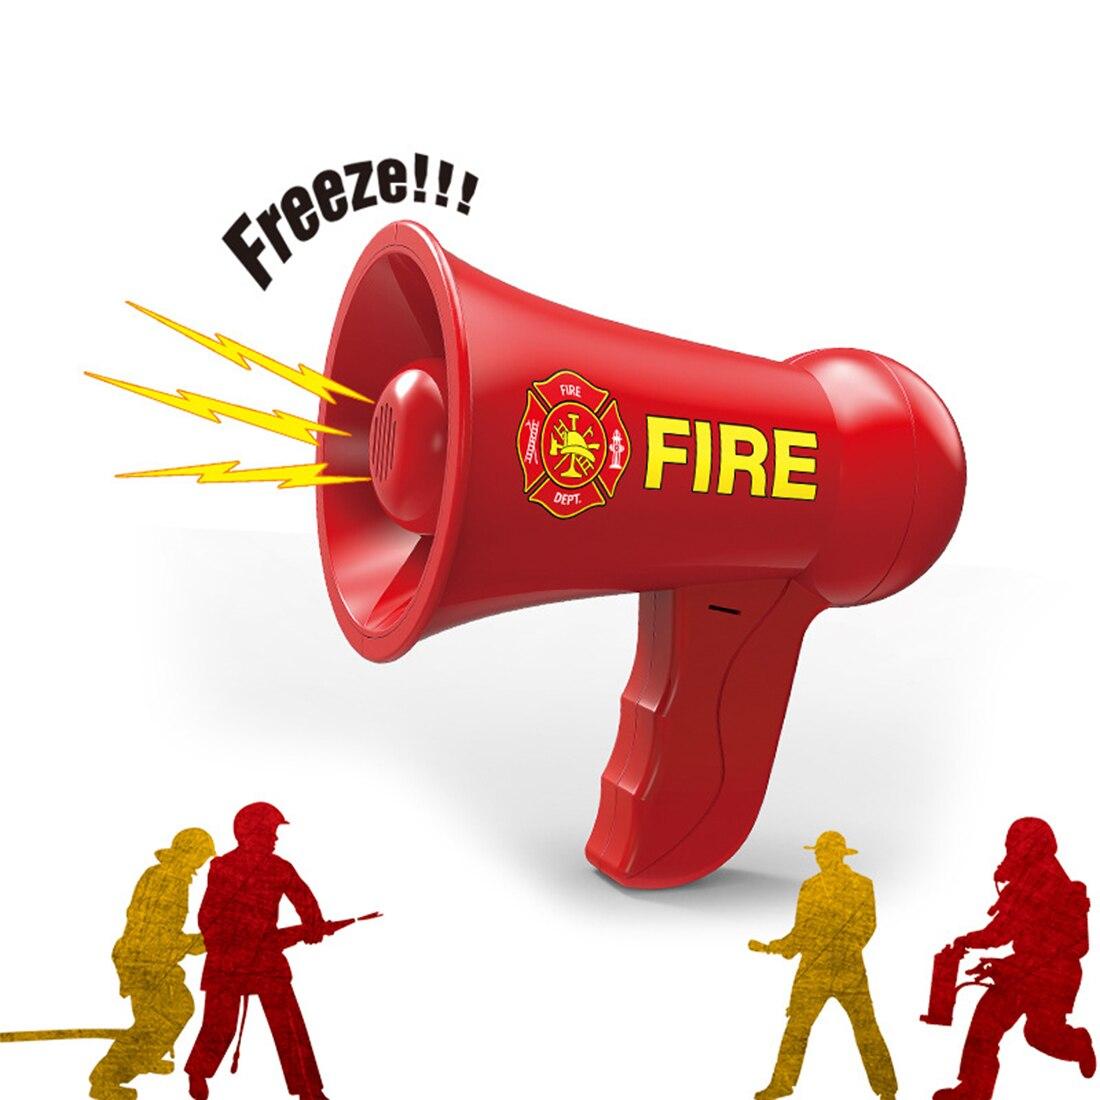 Chikdren Pretend Play Firefighter Fireman Bullhorn Megaphone Other Occupations Toys 2019 Christmas Gift Toys Kids